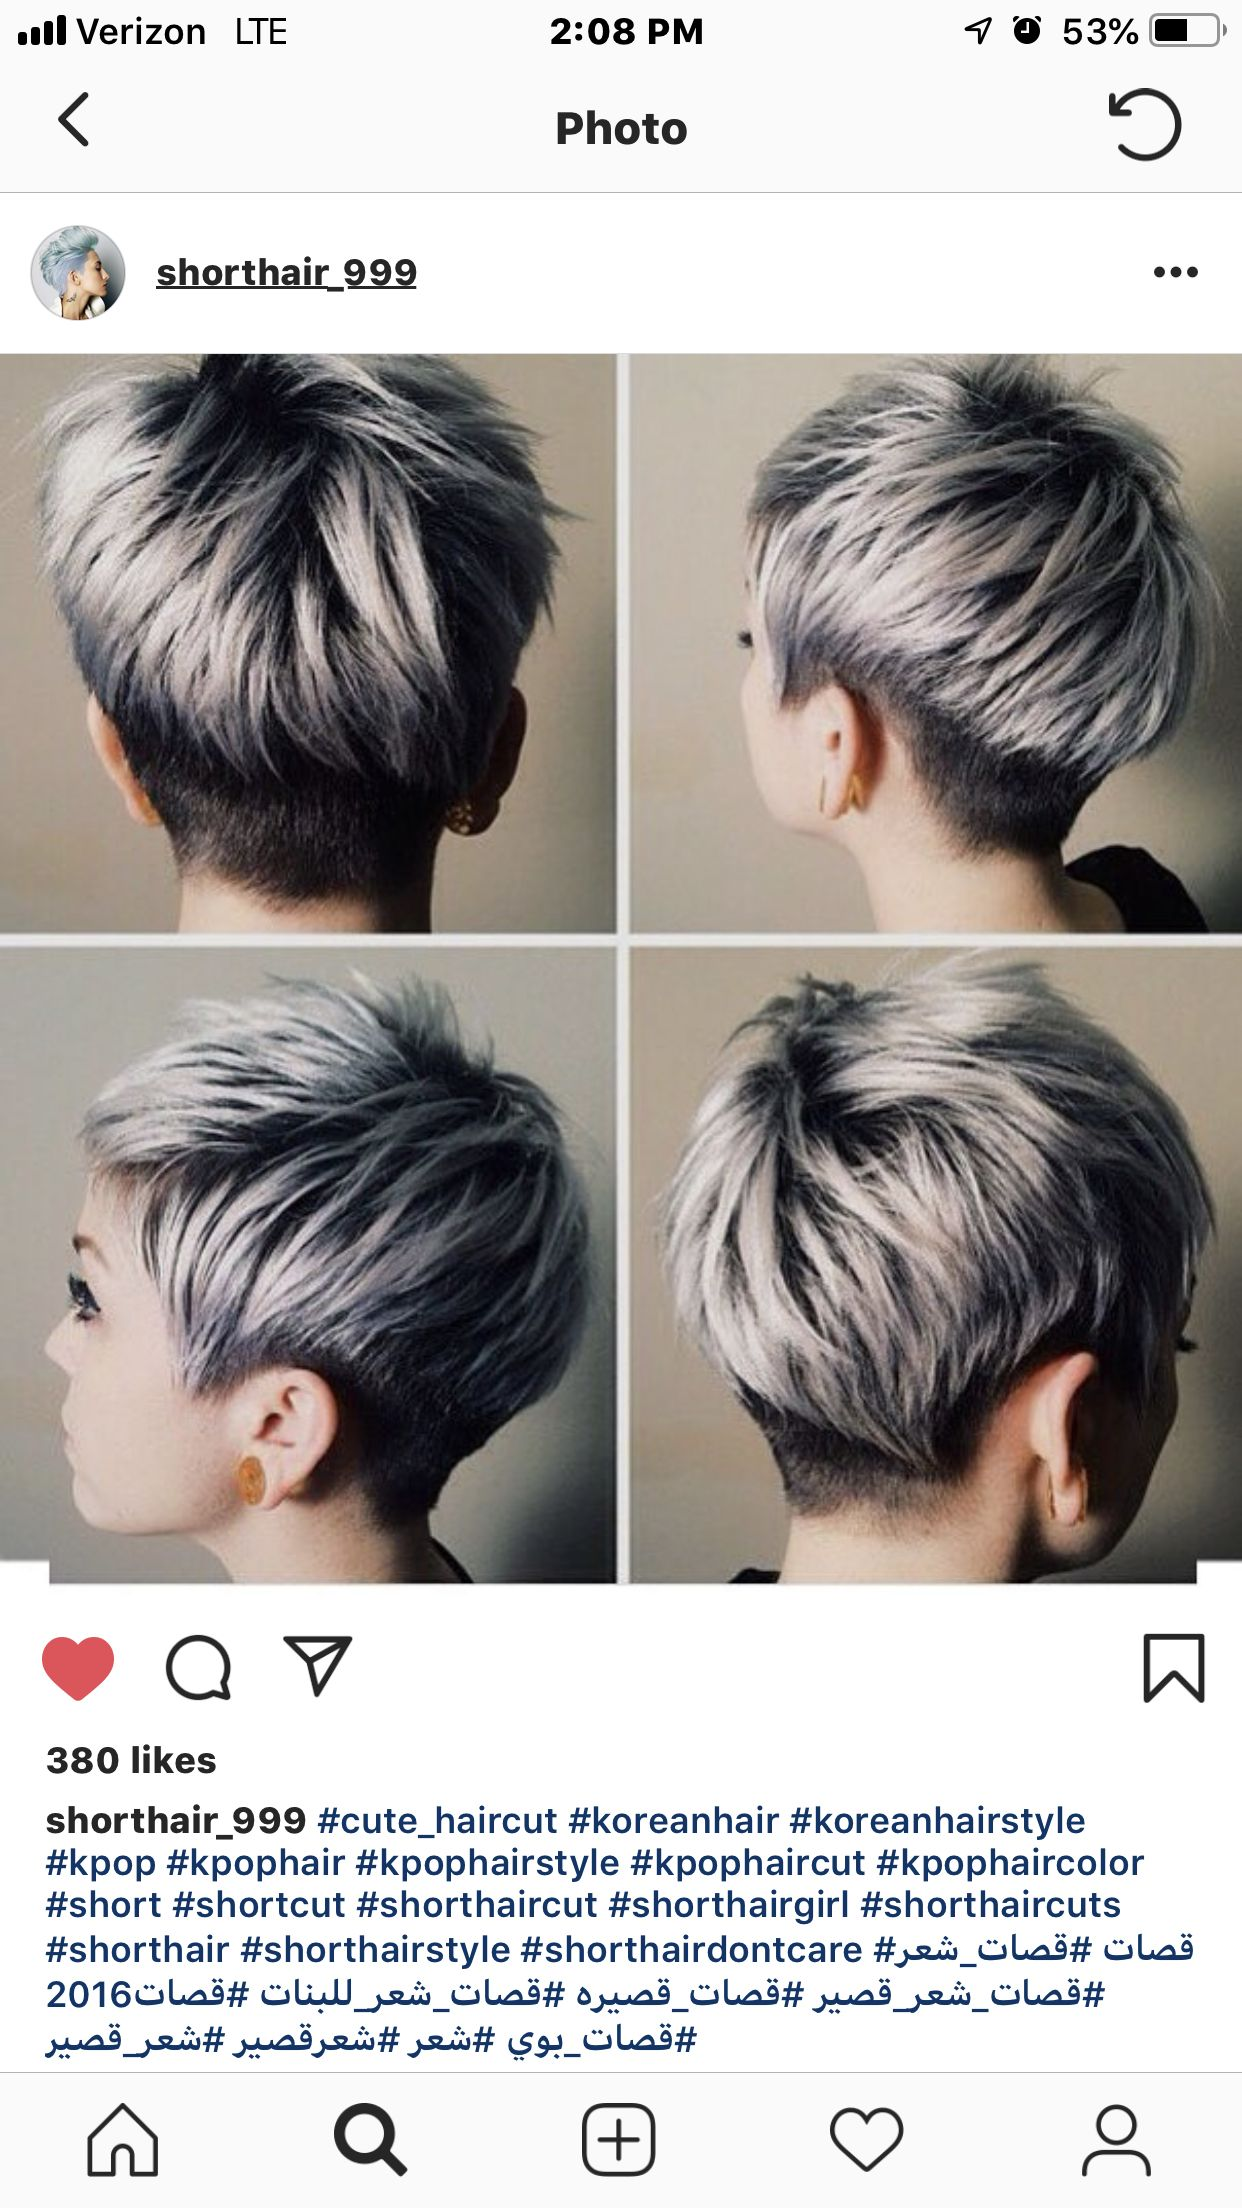 Pin By Chele Deardorff On Cute Hairstyle Short Hair Styles Dark Hair With Highlights Hair Styles